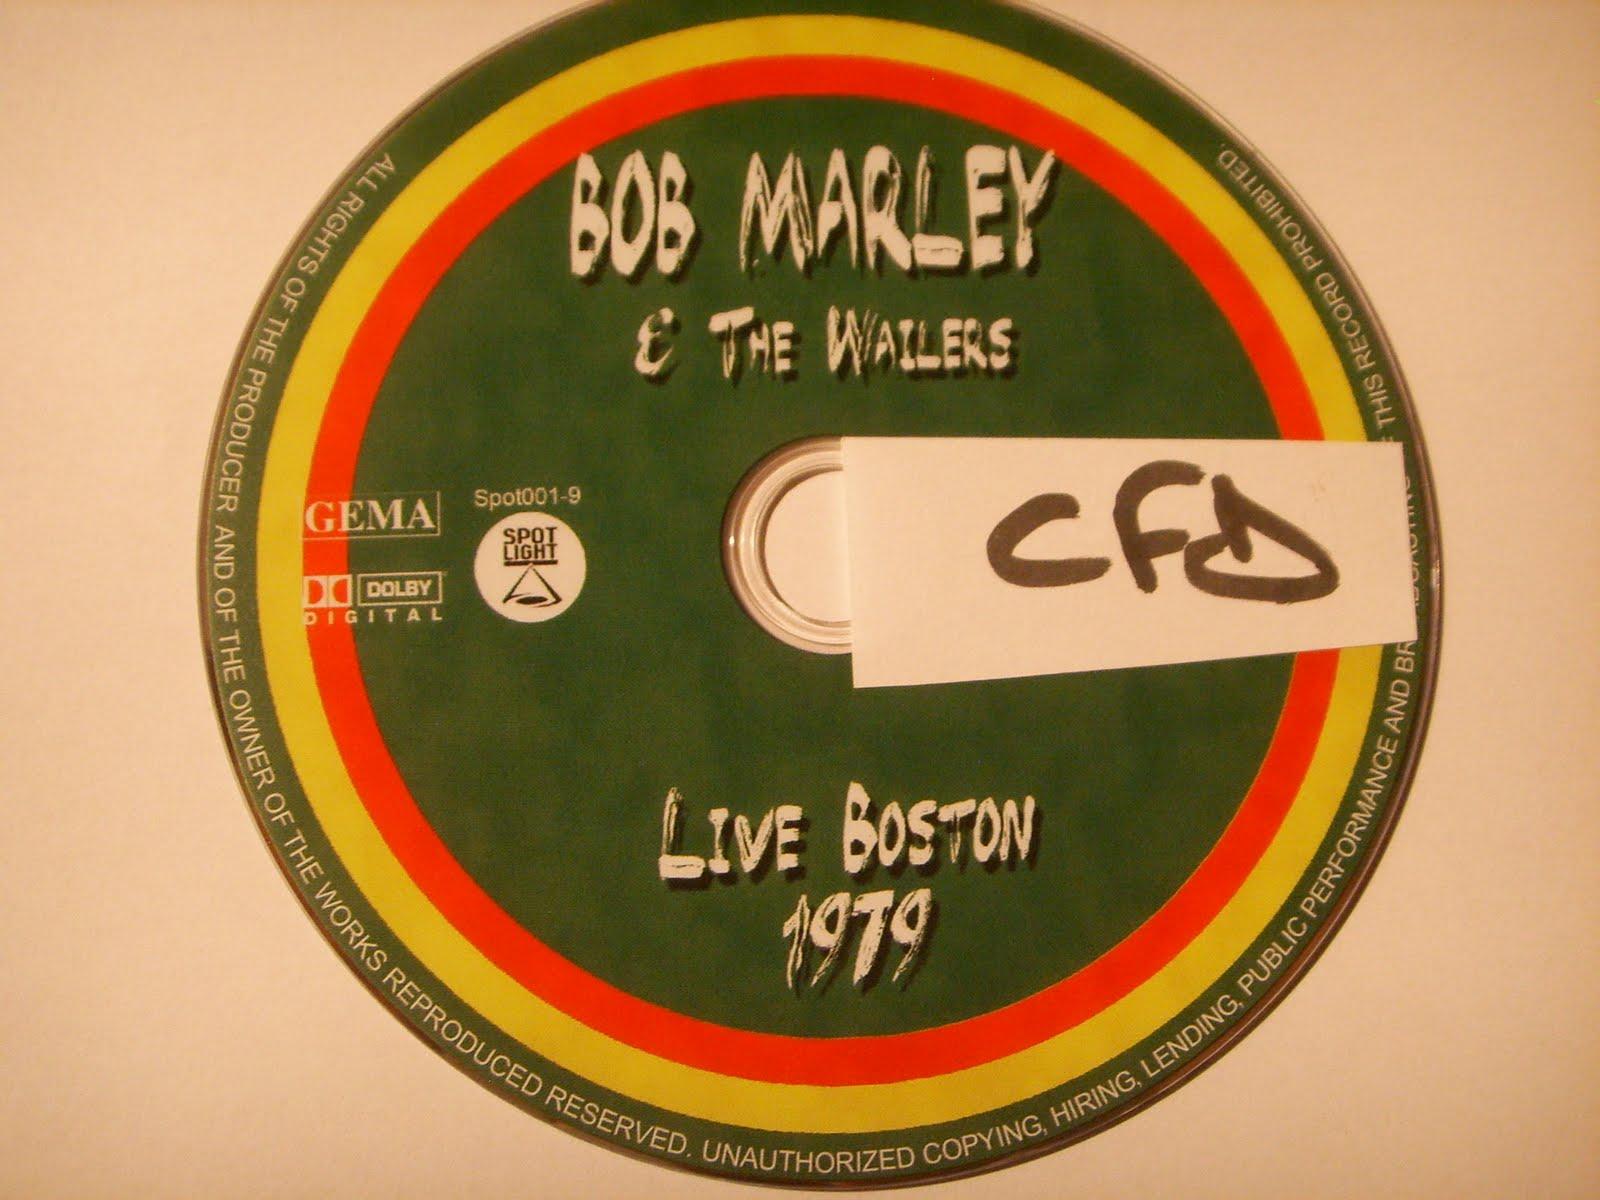 BOB MARLEY & THE WAILERS HARVARD STADIUM (1979) DVDR NLT-Rel